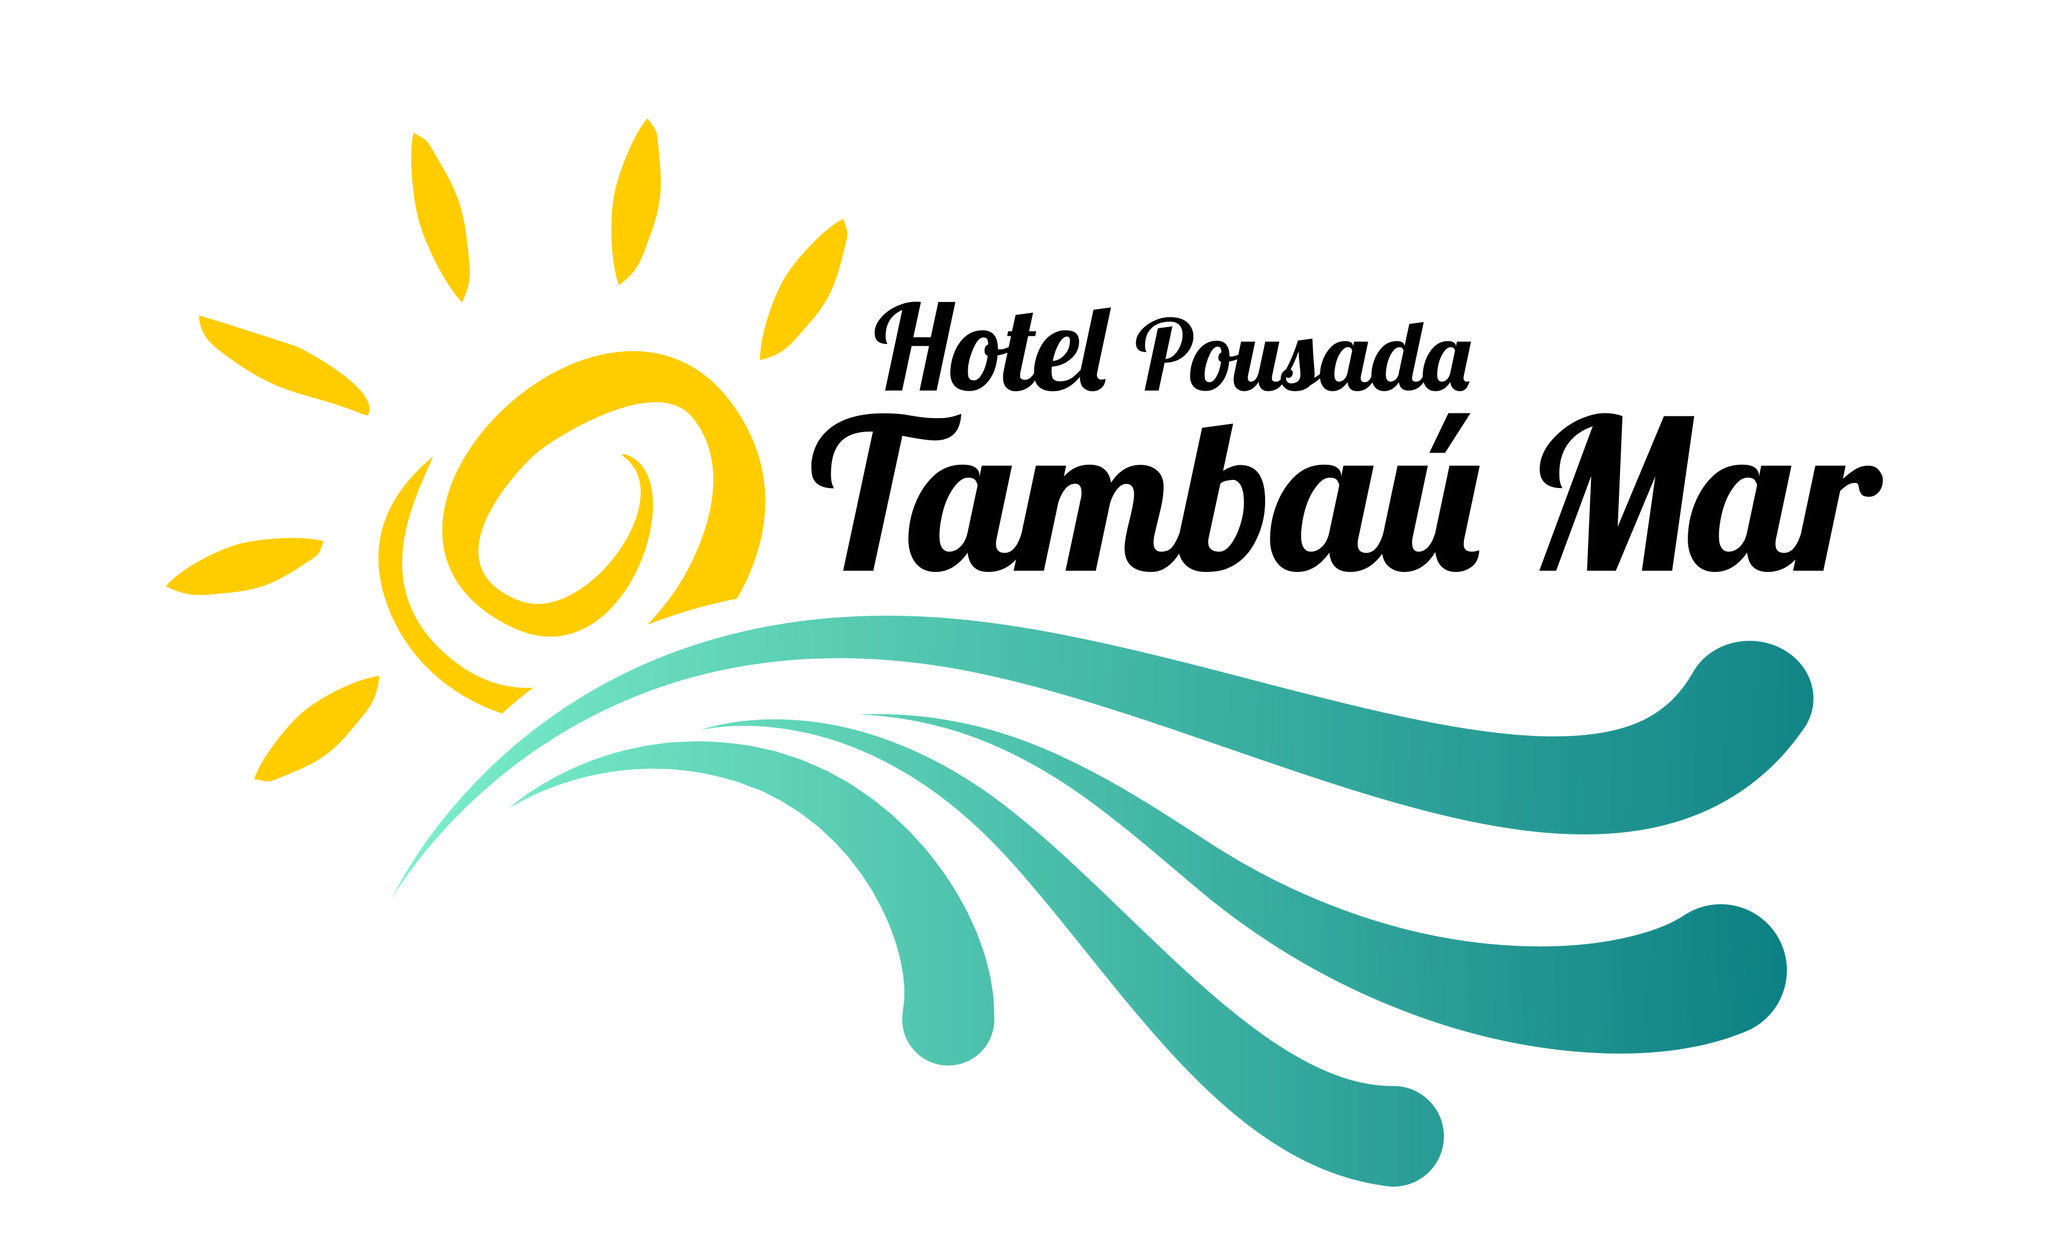 Hotel Pousada Tambaú Mar